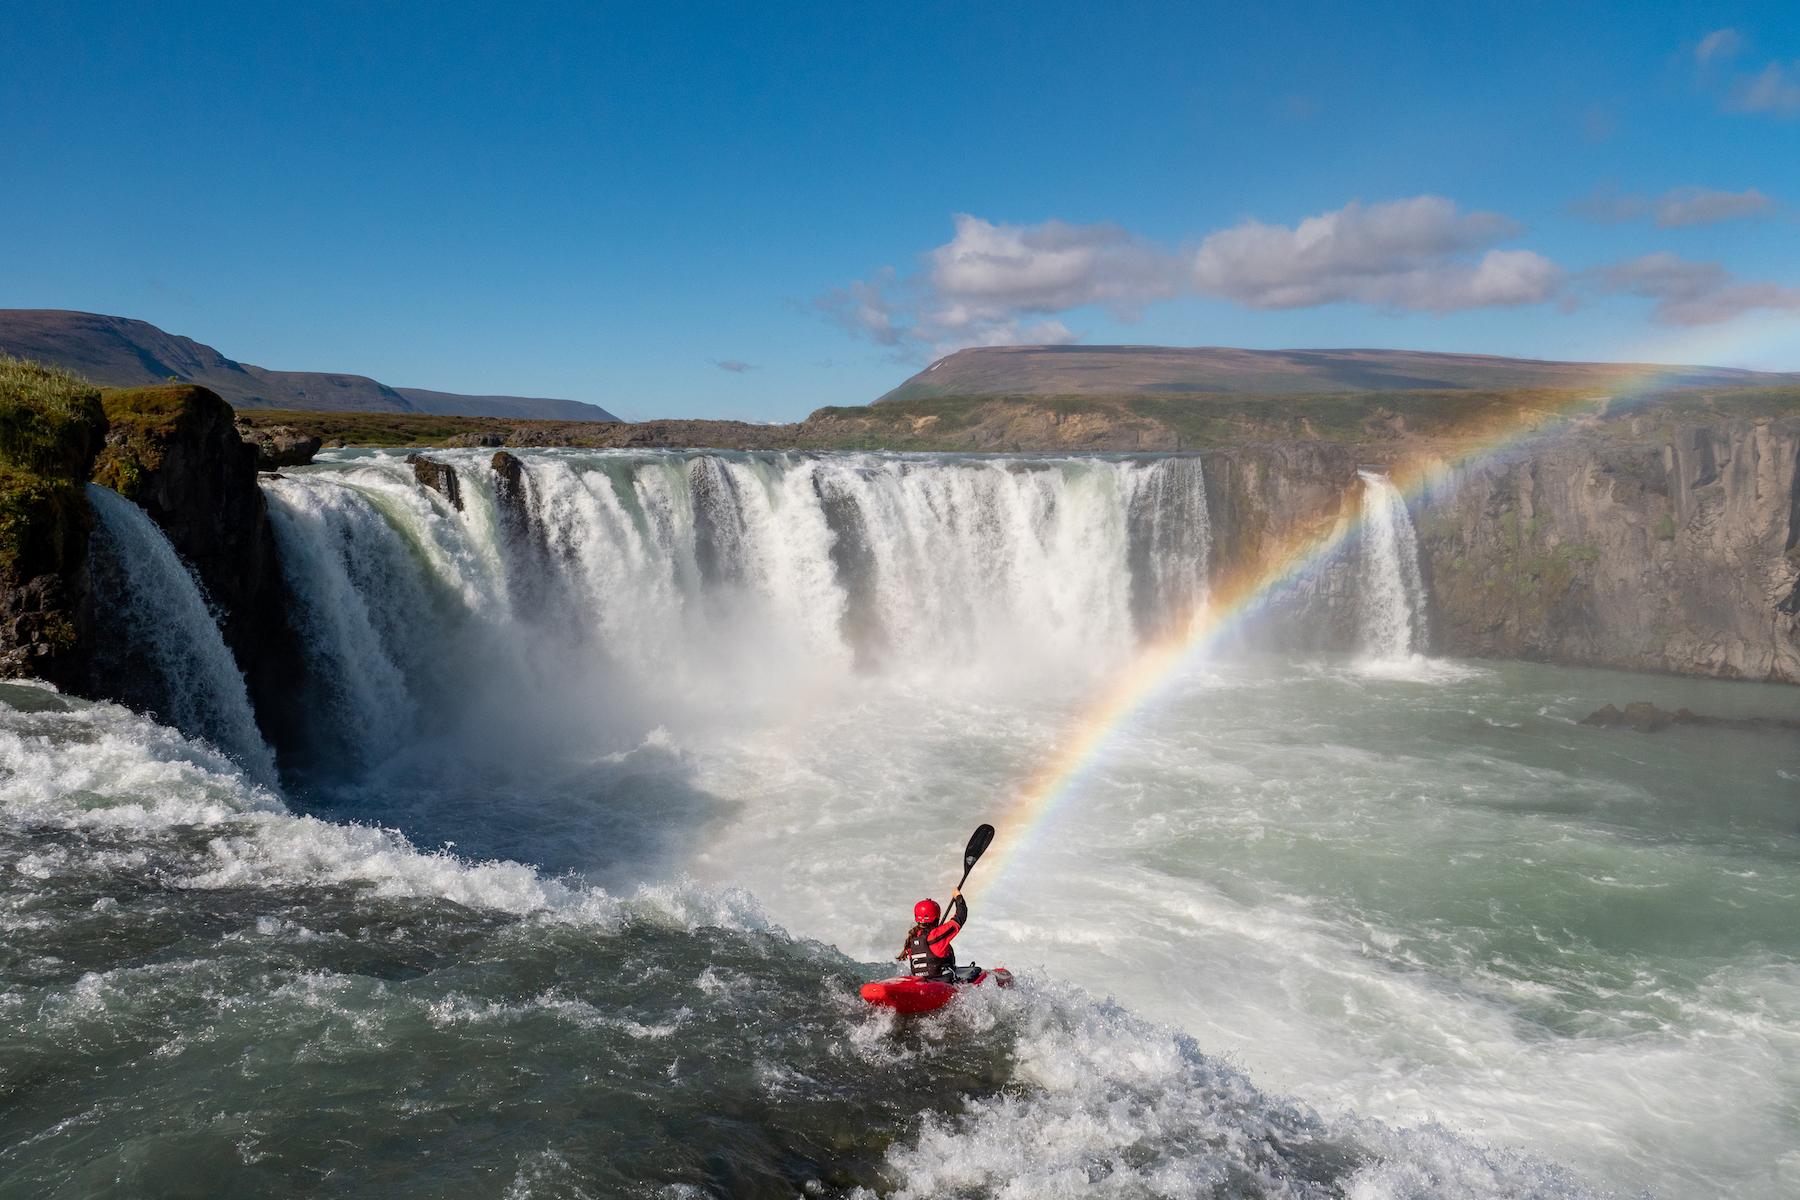 Alice Dullehan Kayaking Godafoss Iceland Andy Kettlewell/Pistyll Productions